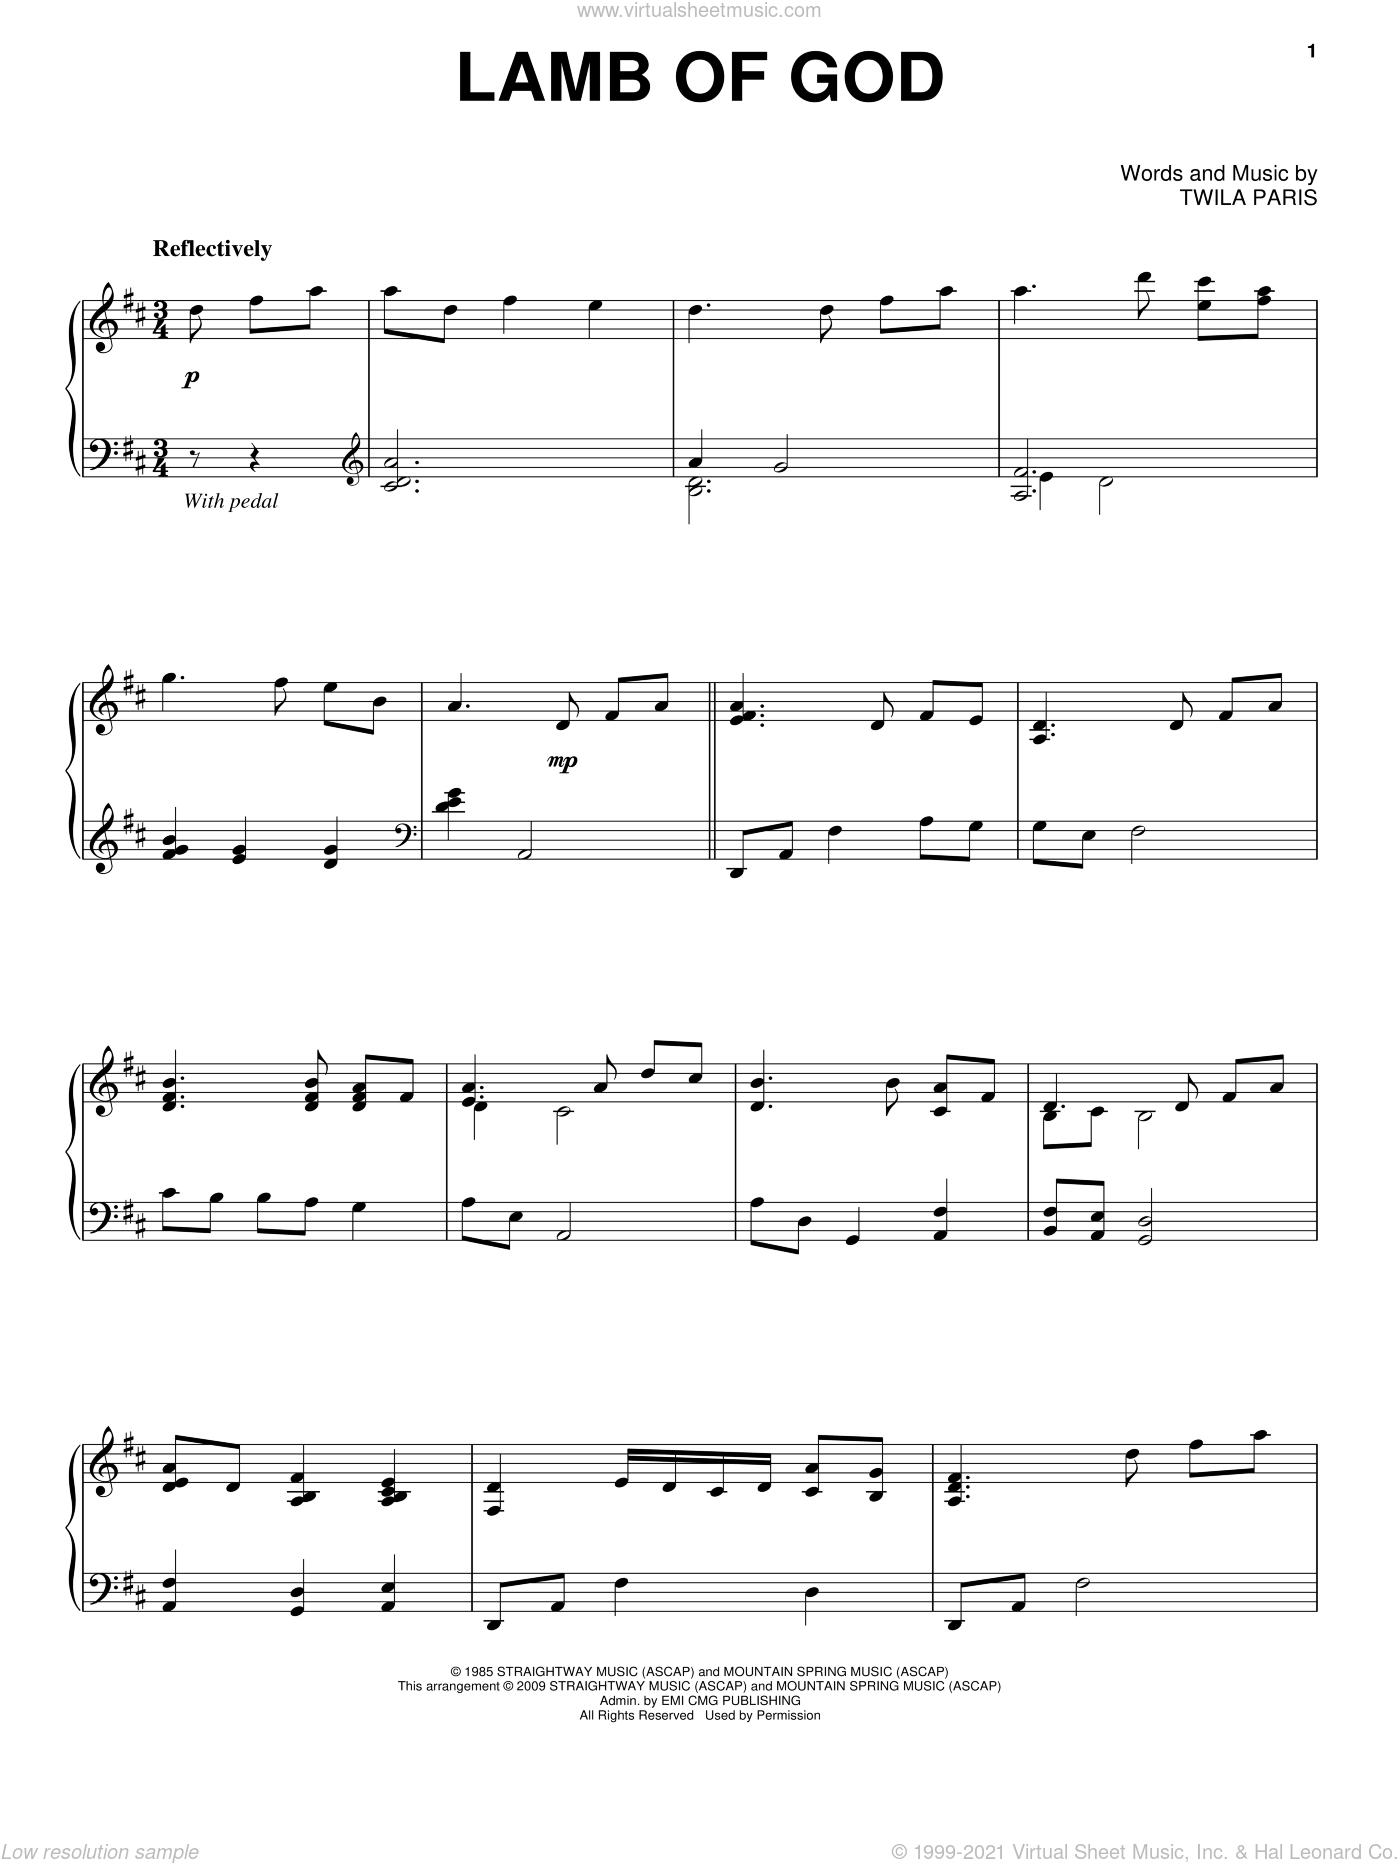 Lamb Of God, (intermediate) sheet music for piano solo by Twila Paris, intermediate skill level